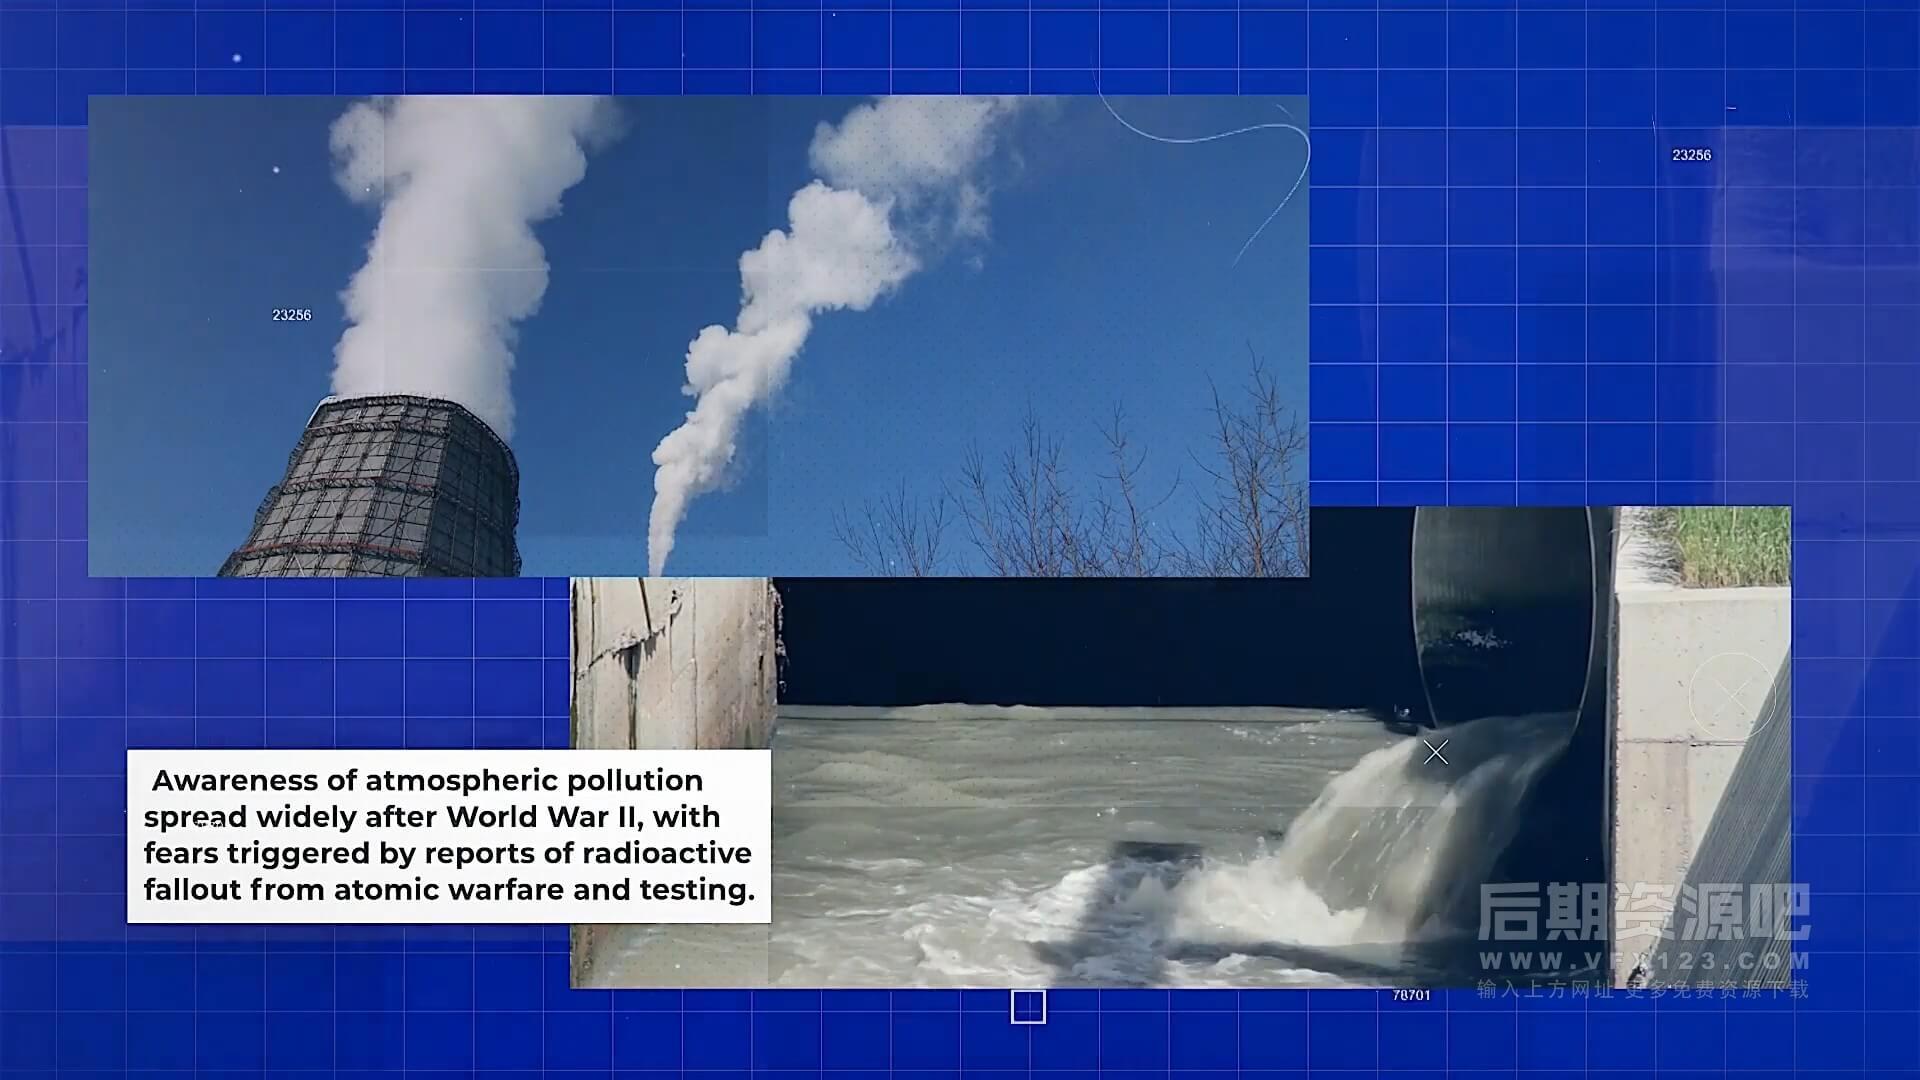 fcpx插件 10组纪录片新闻播报画中画图文展示模板 Pollution Documentary